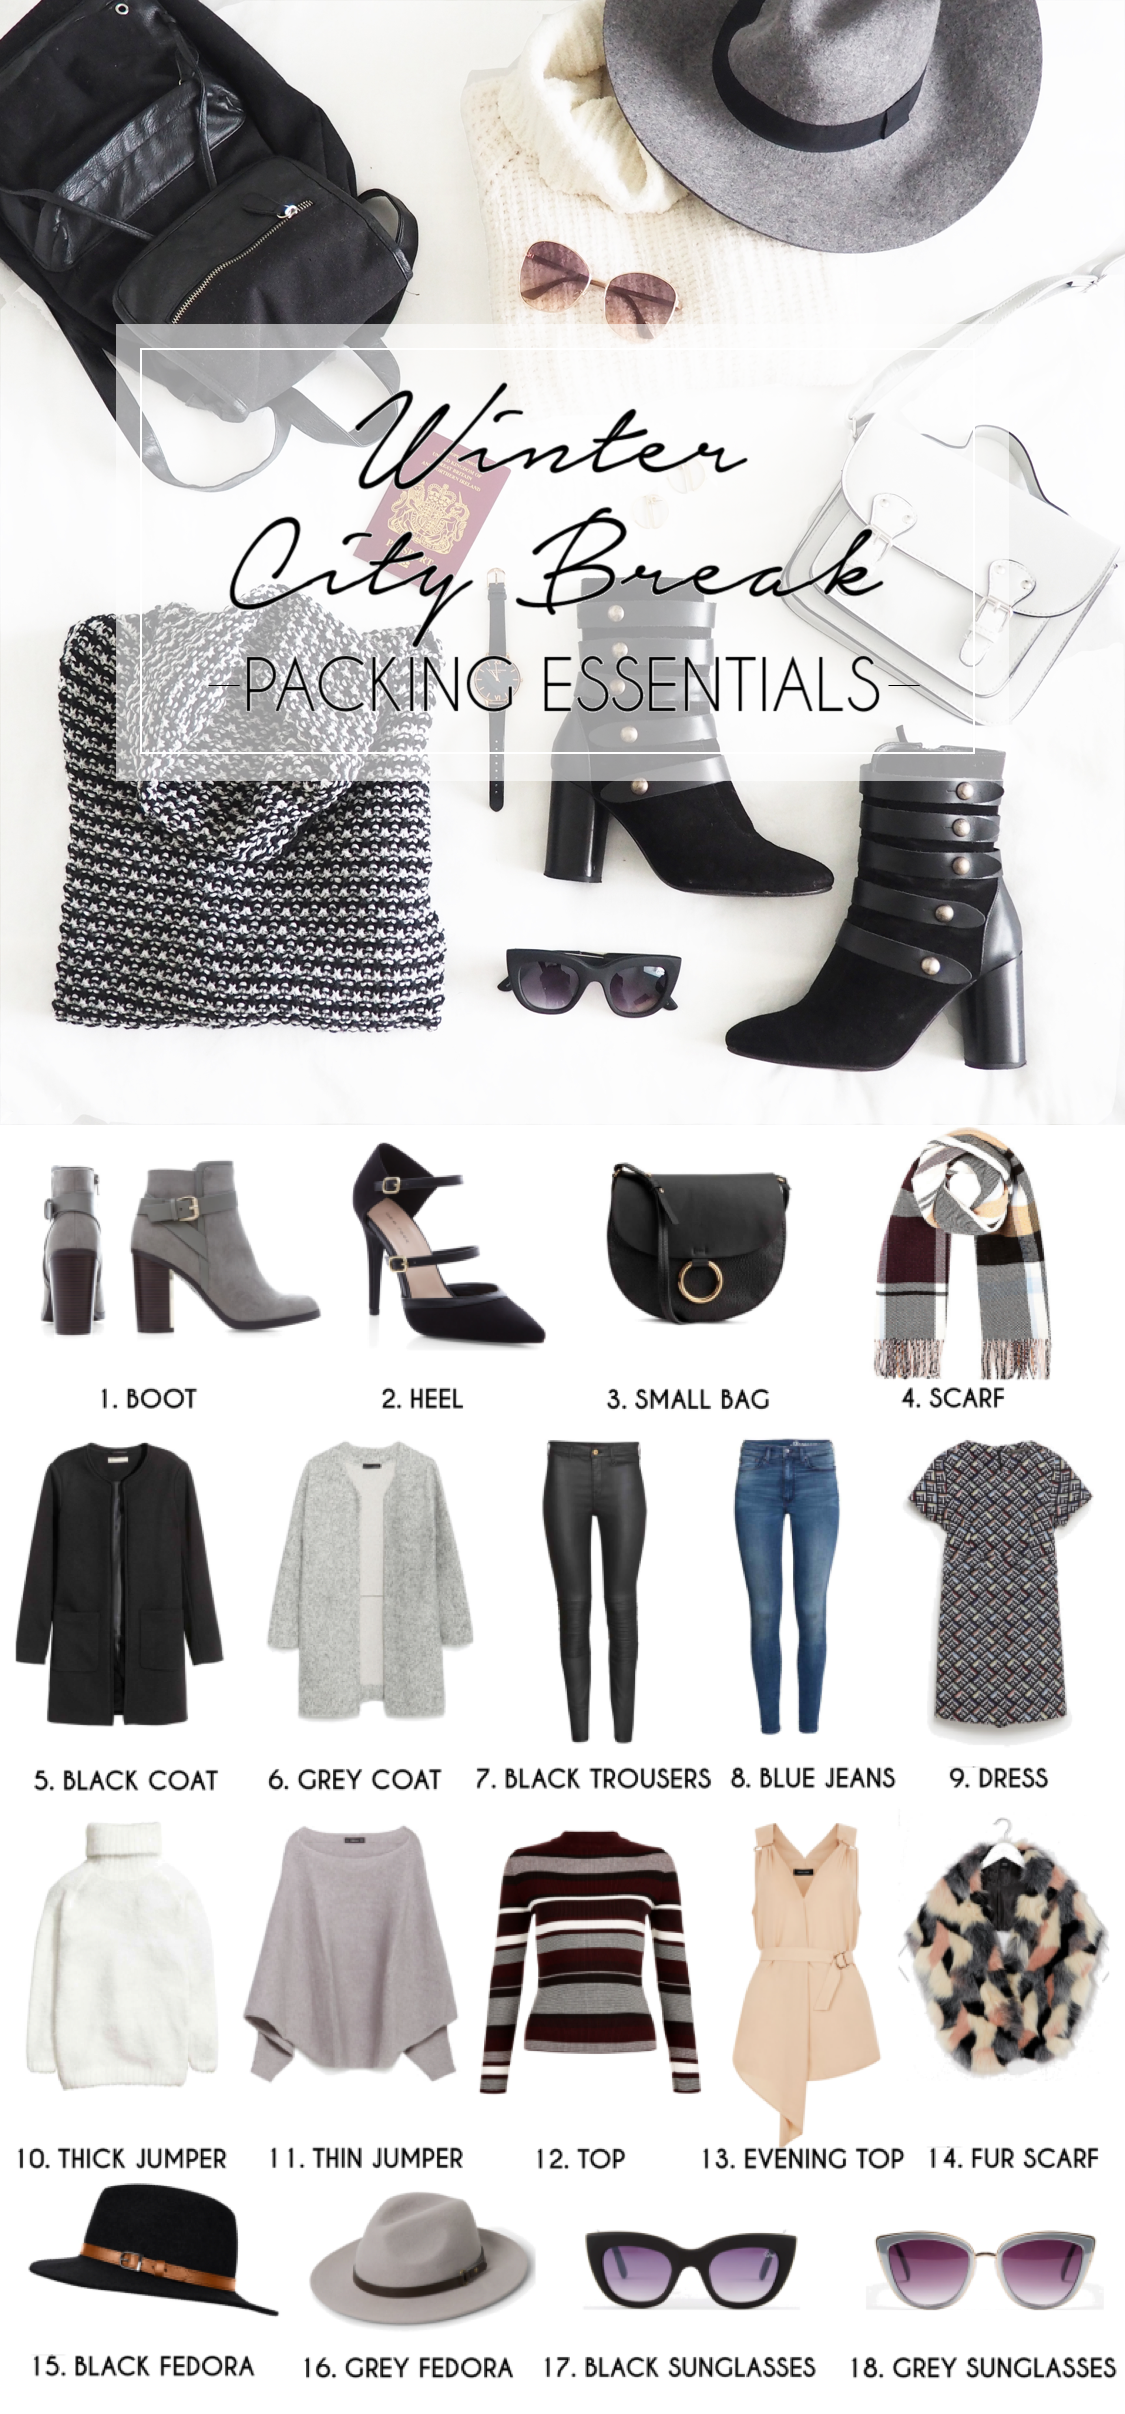 Suitcase Essentials: The Winter Getaway